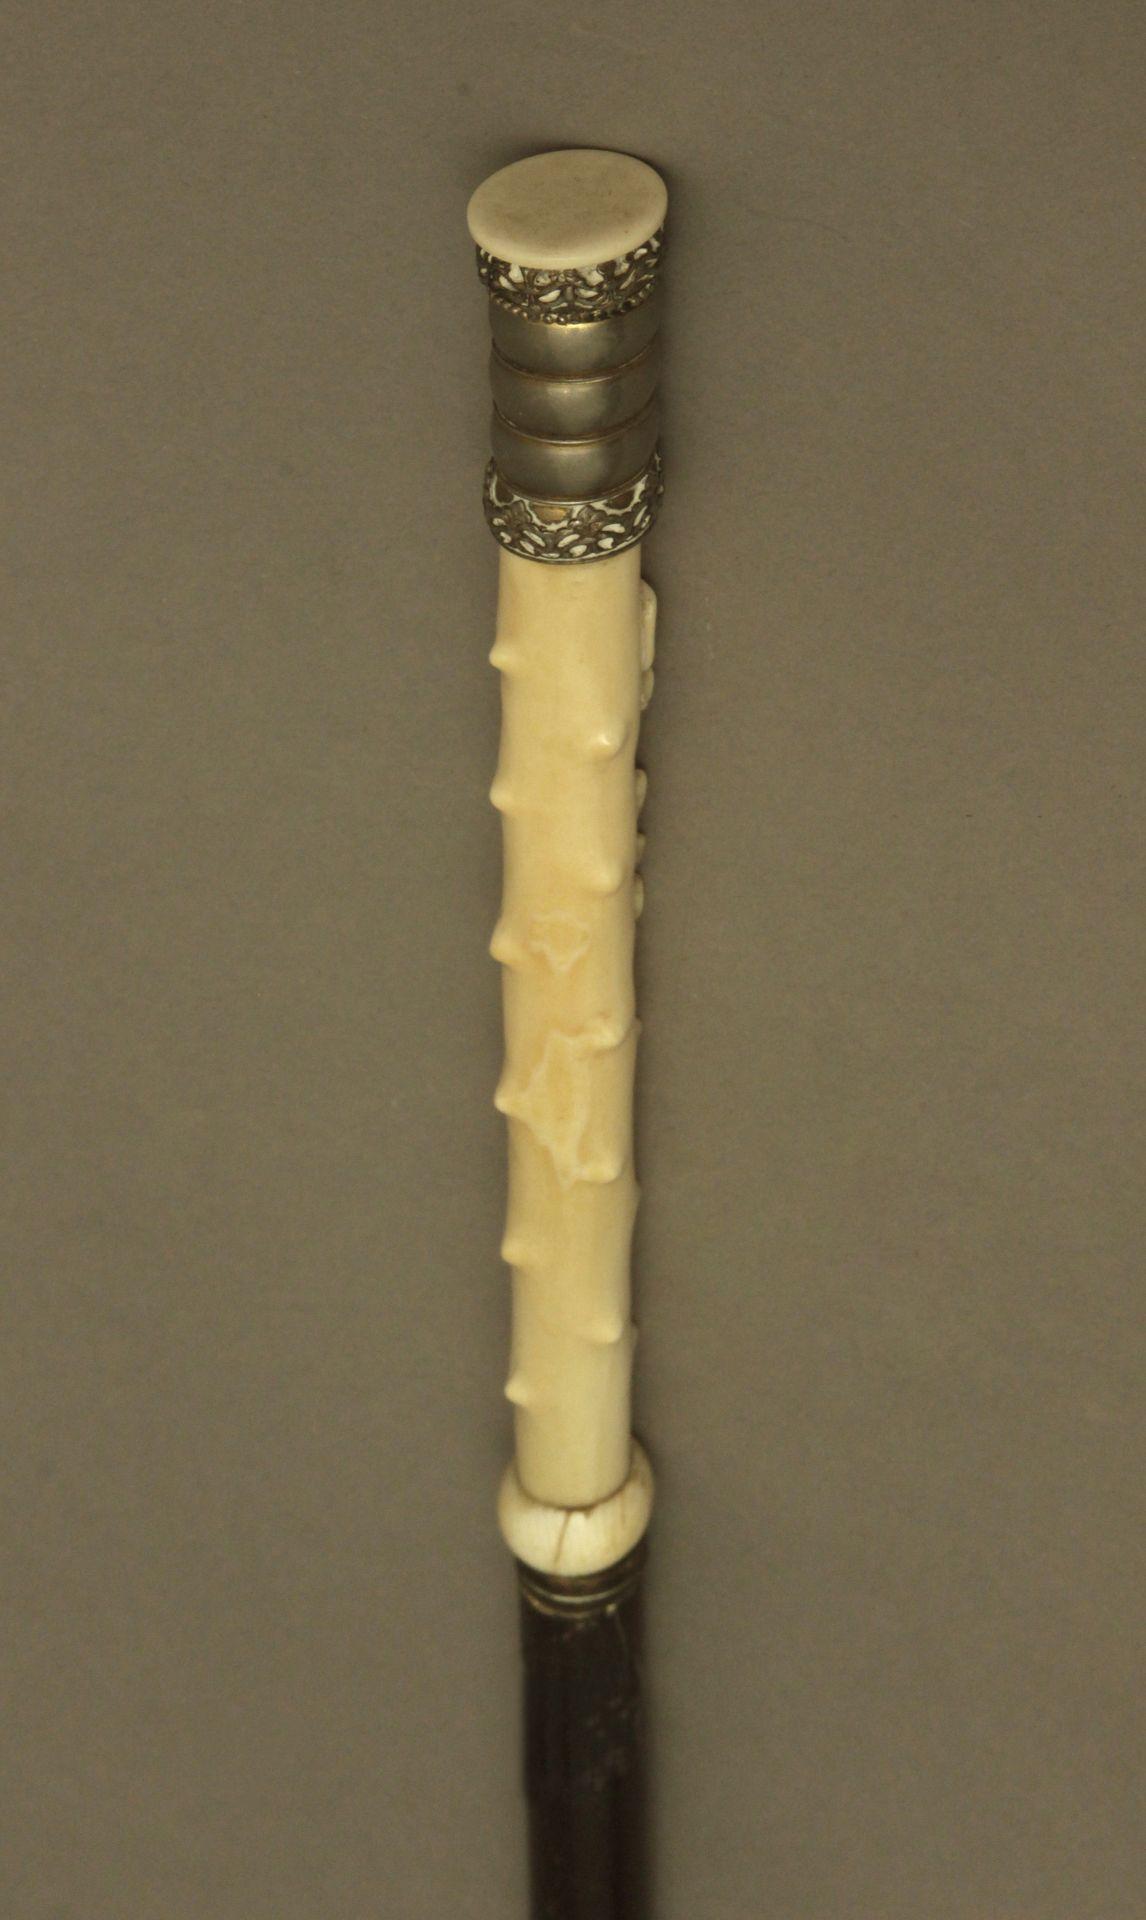 An ivory handled walking stick circa 1900 - Bild 5 aus 9